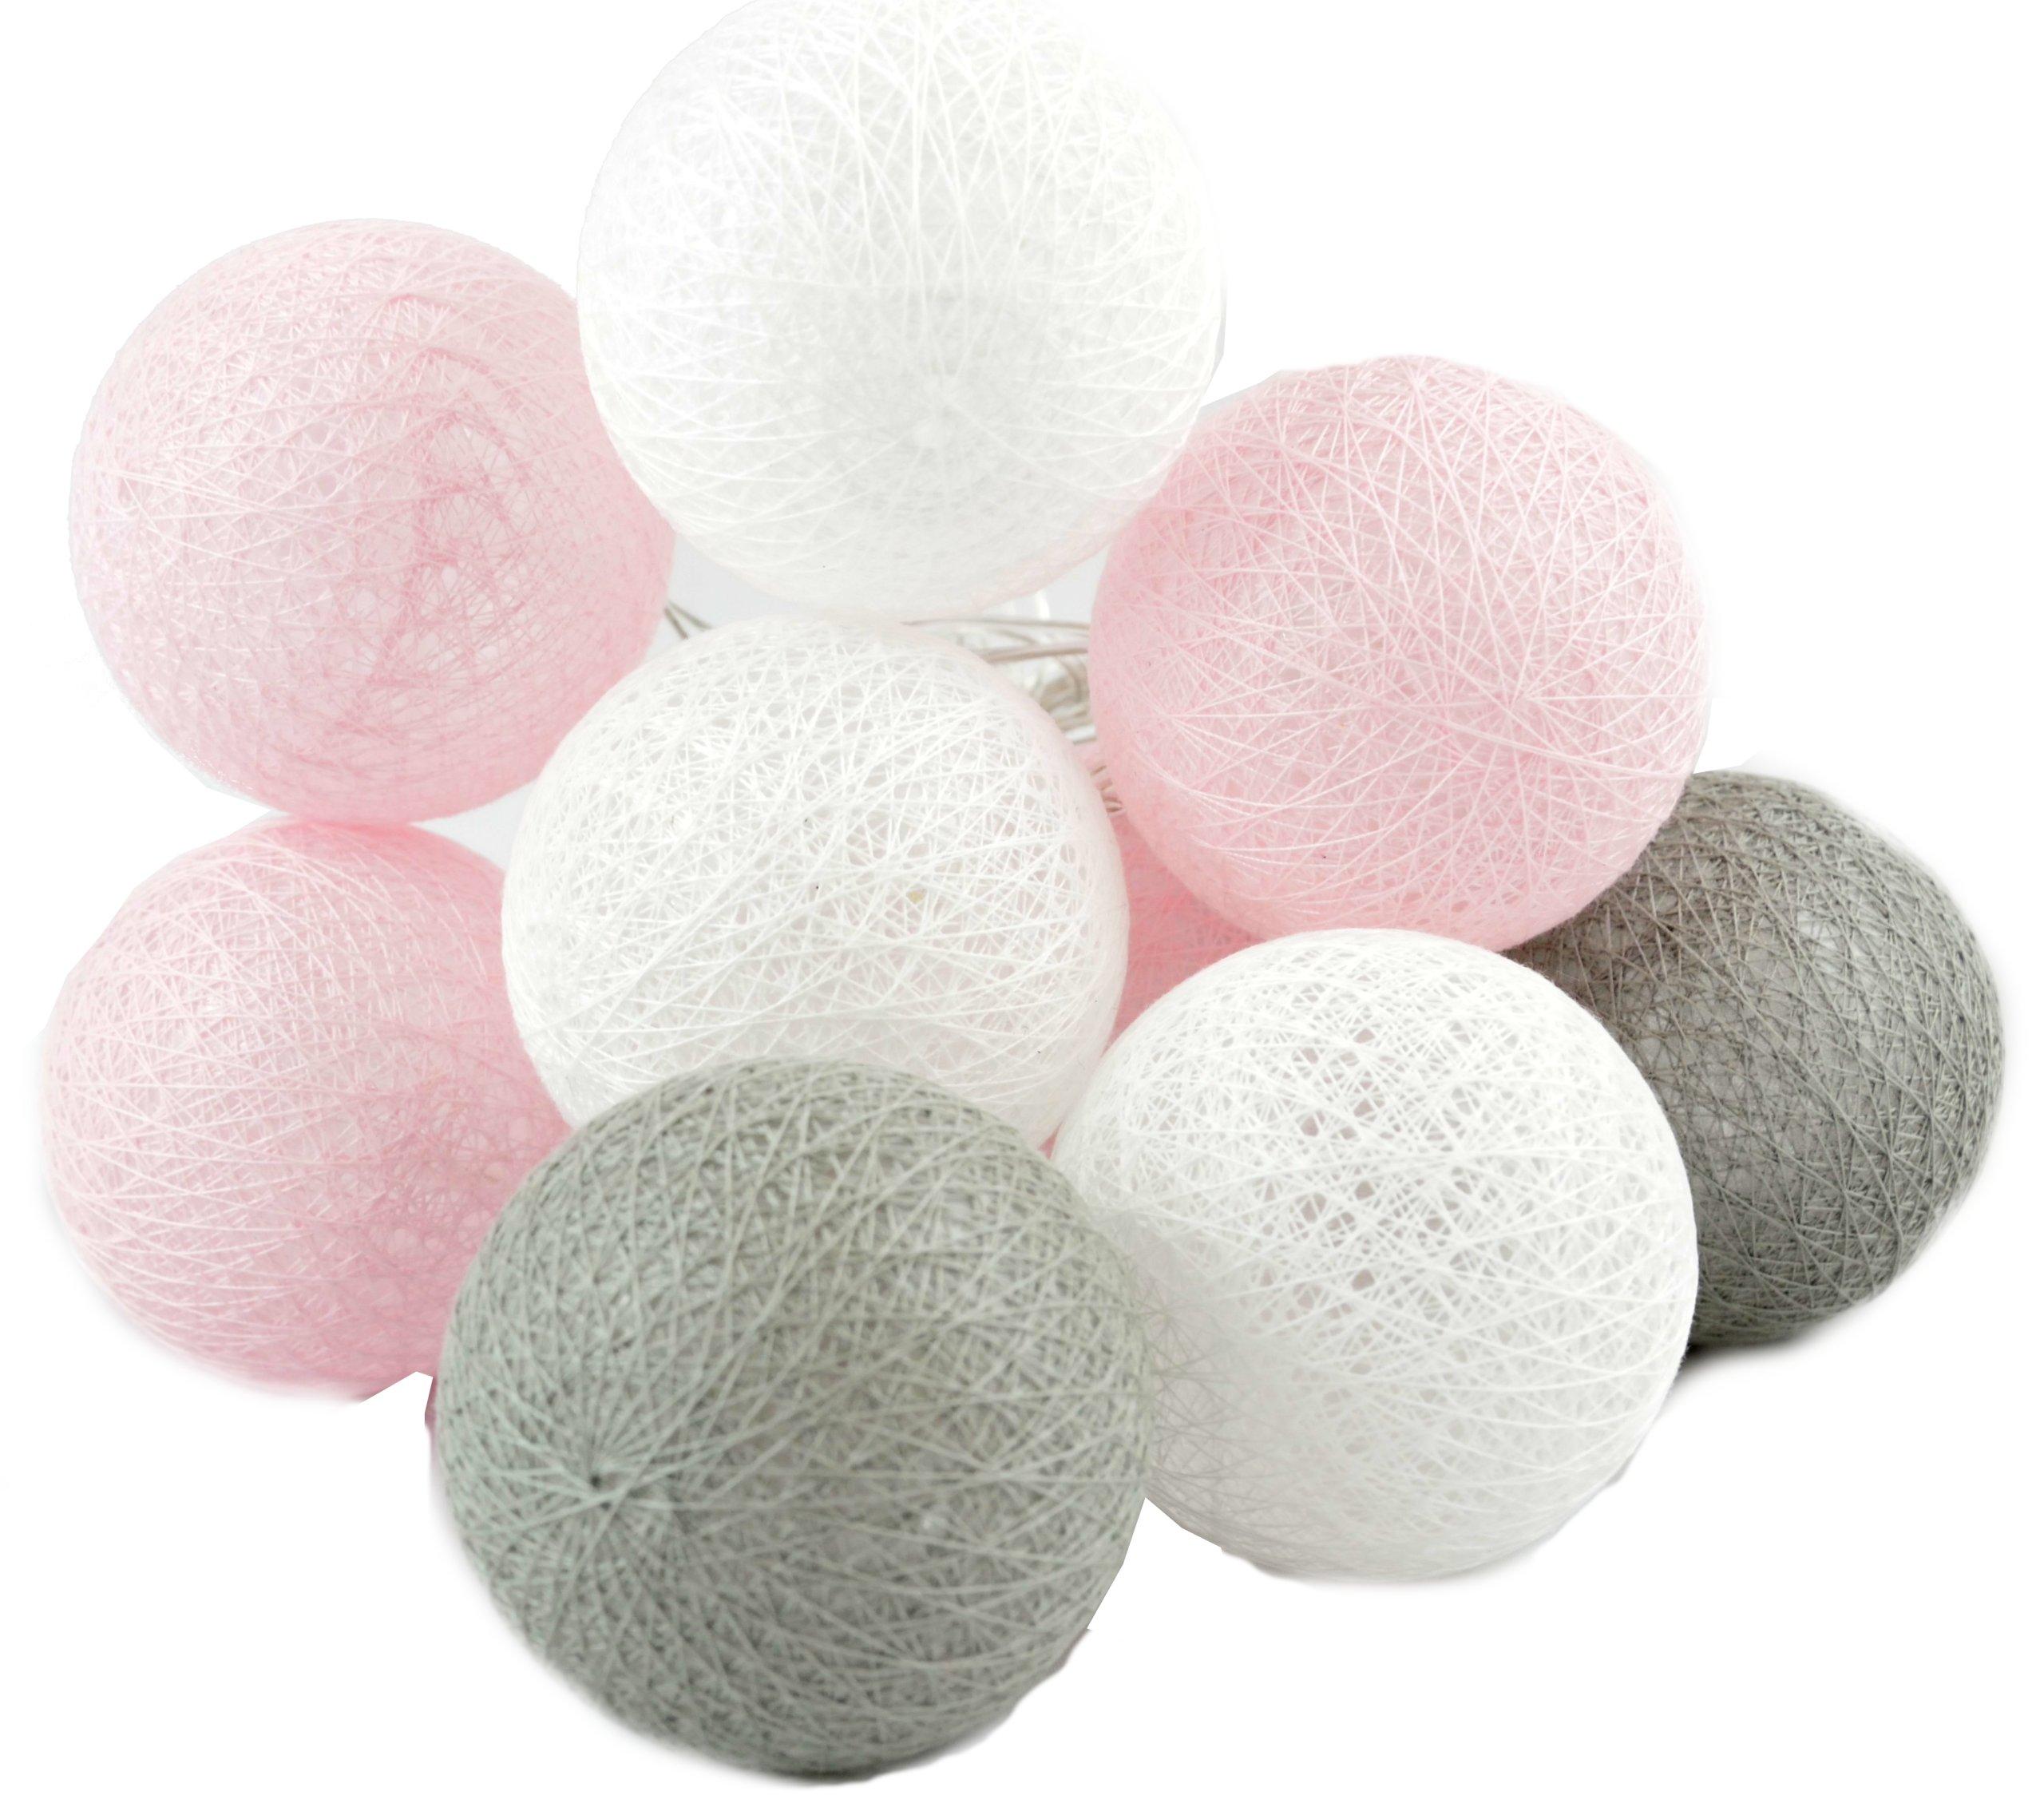 Cotton Ball świecące Kule Girlanda 10 Led Lampki